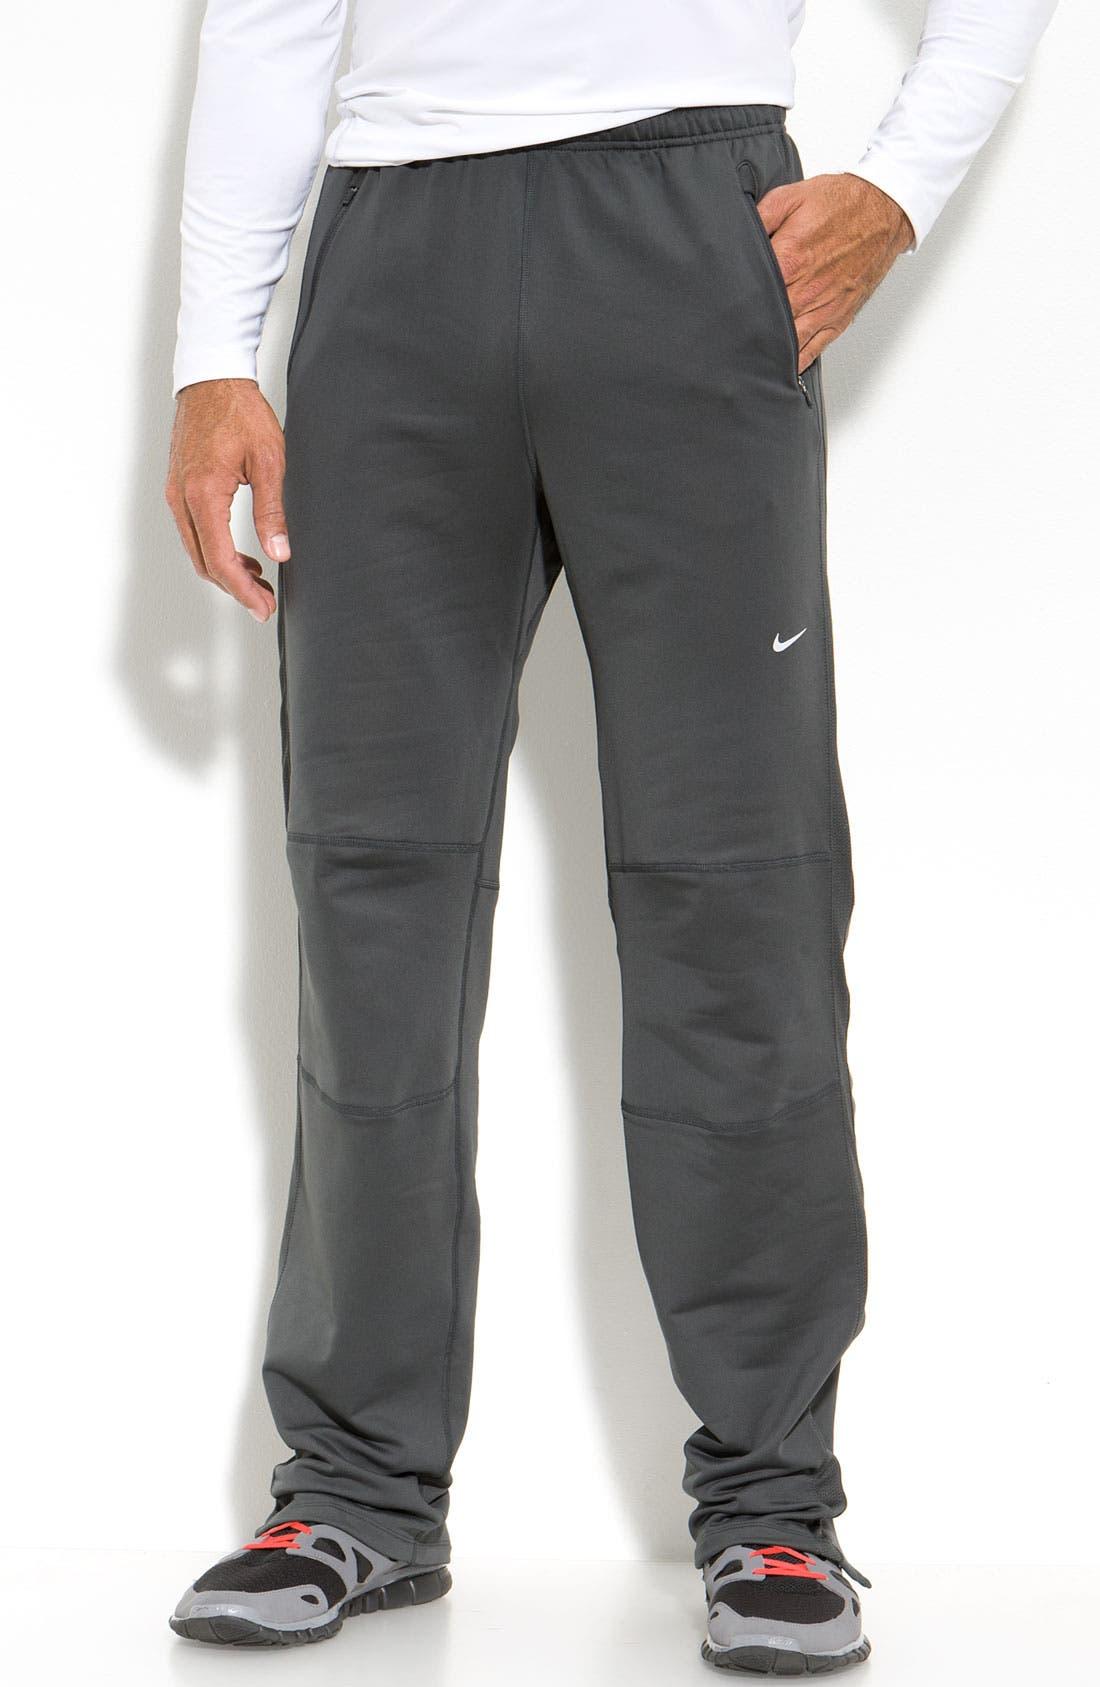 Alternate Image 1 Selected - Nike 'Element' Thermal Pants